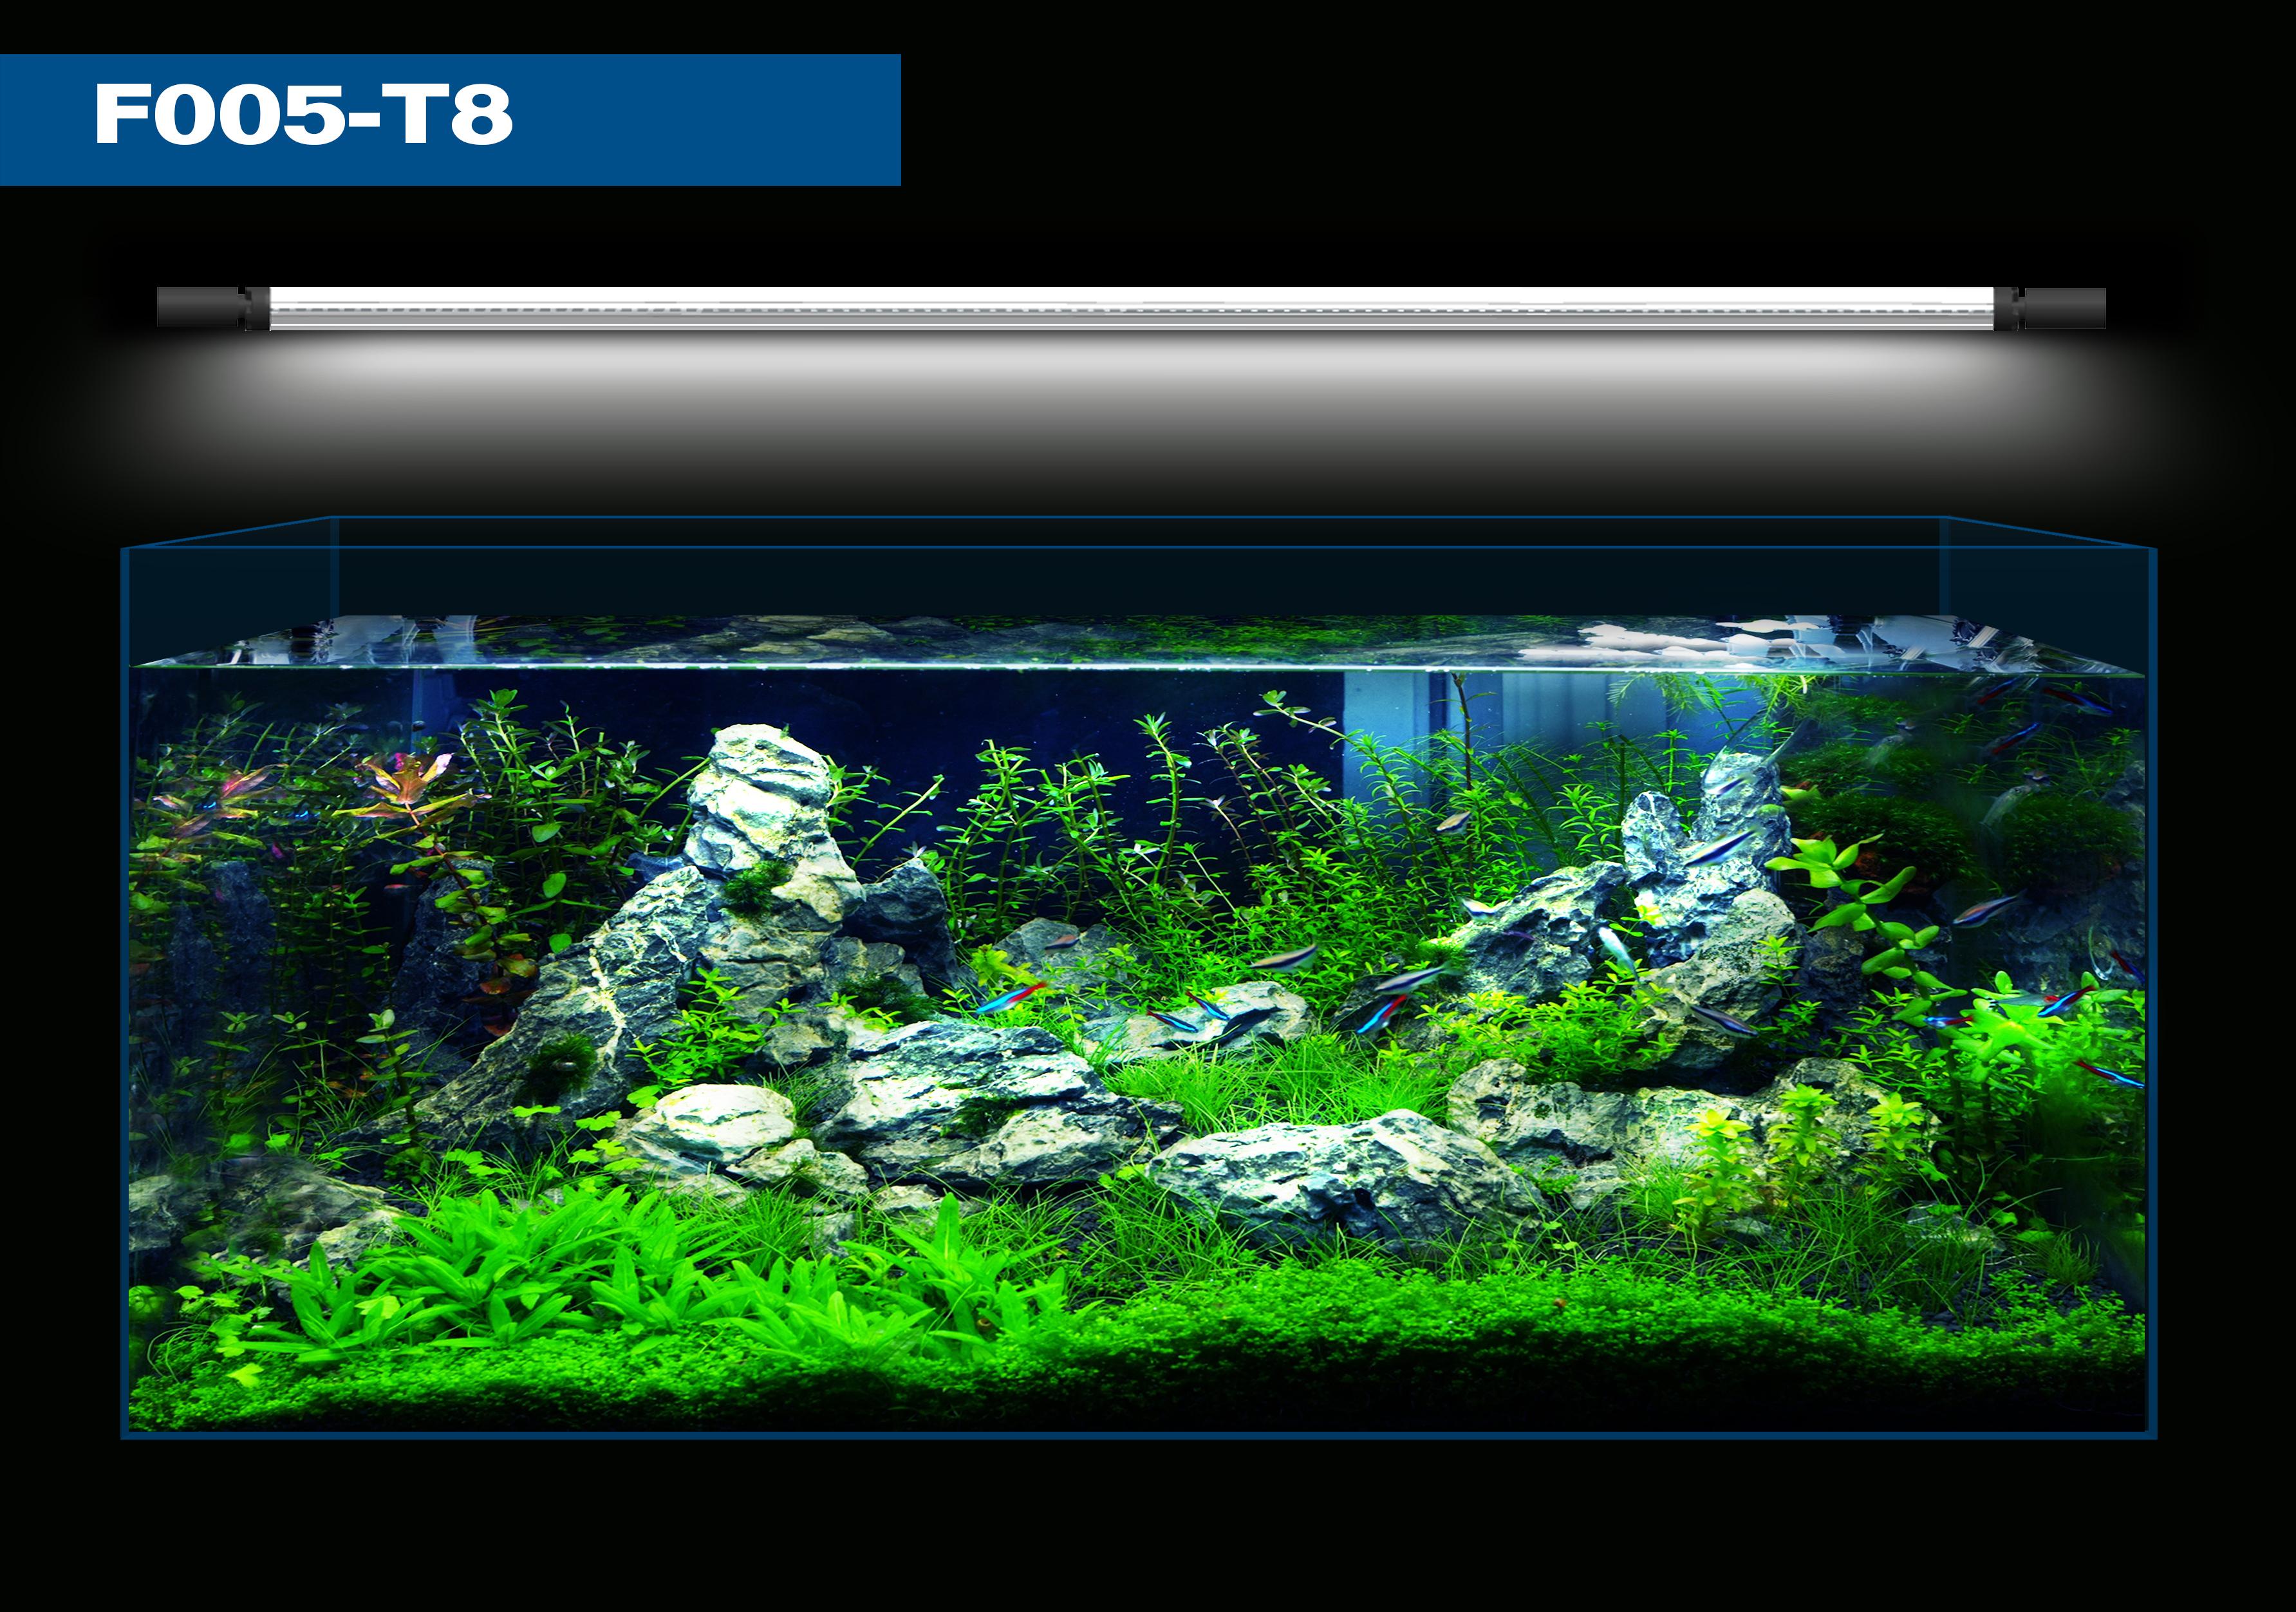 aquarium x view hawkeye led kit h com light walmart lights filtration w ip and with lighting gallon l